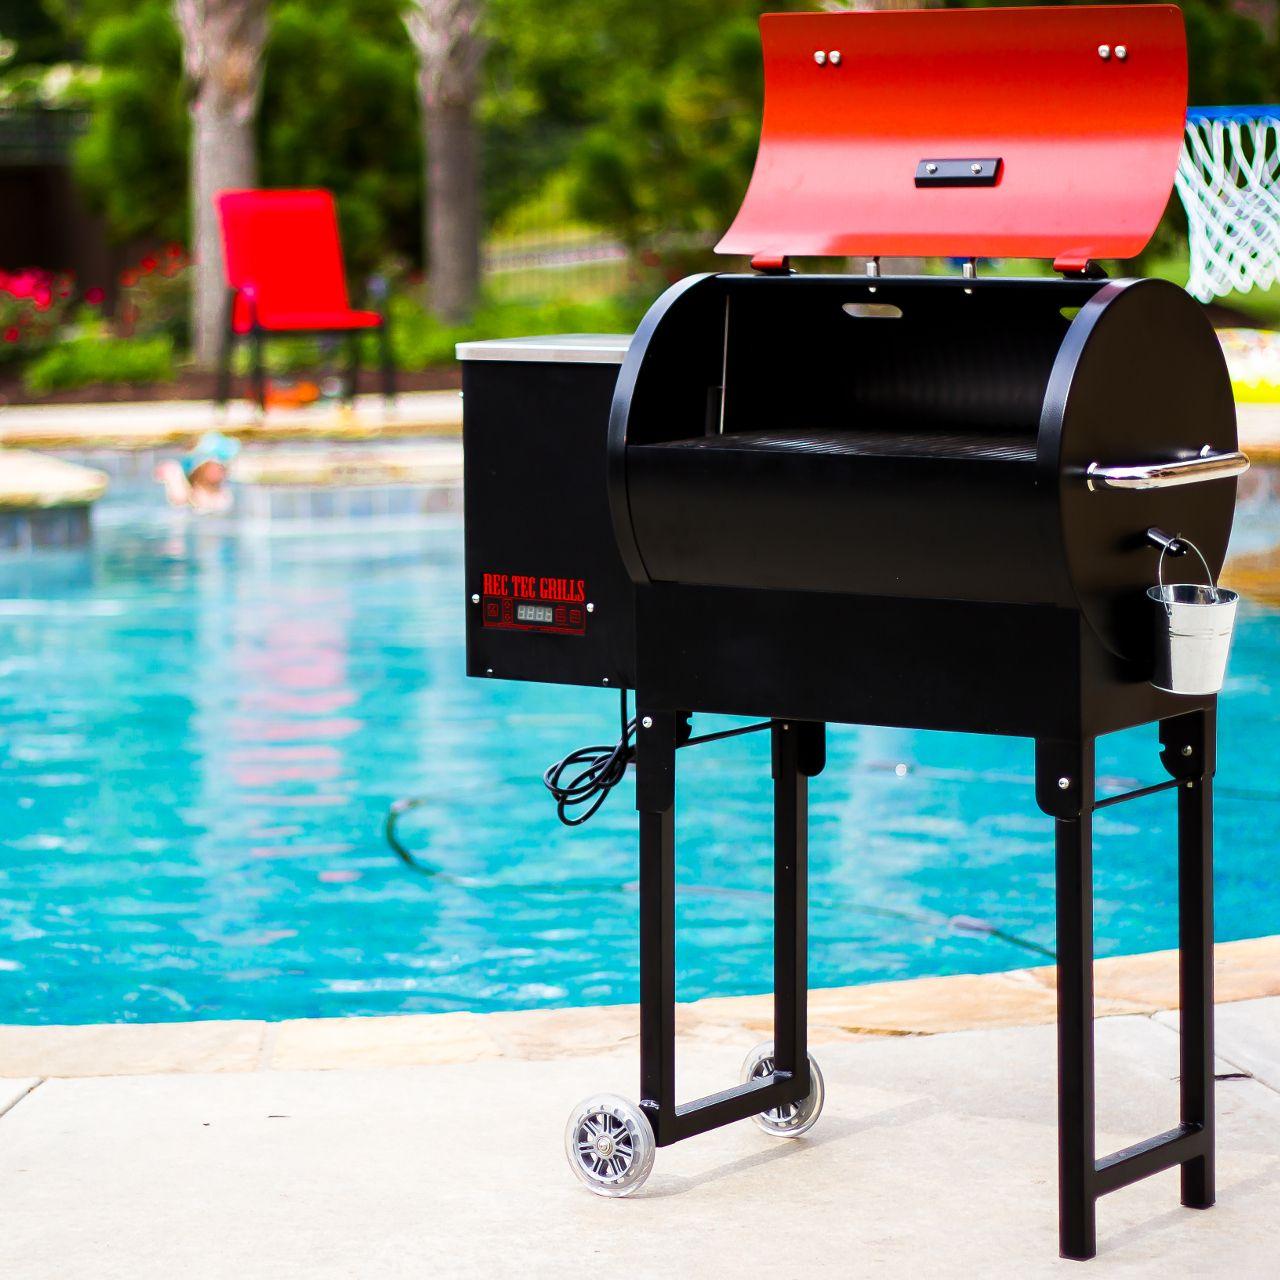 Pin on Love my Rec Tec grill!